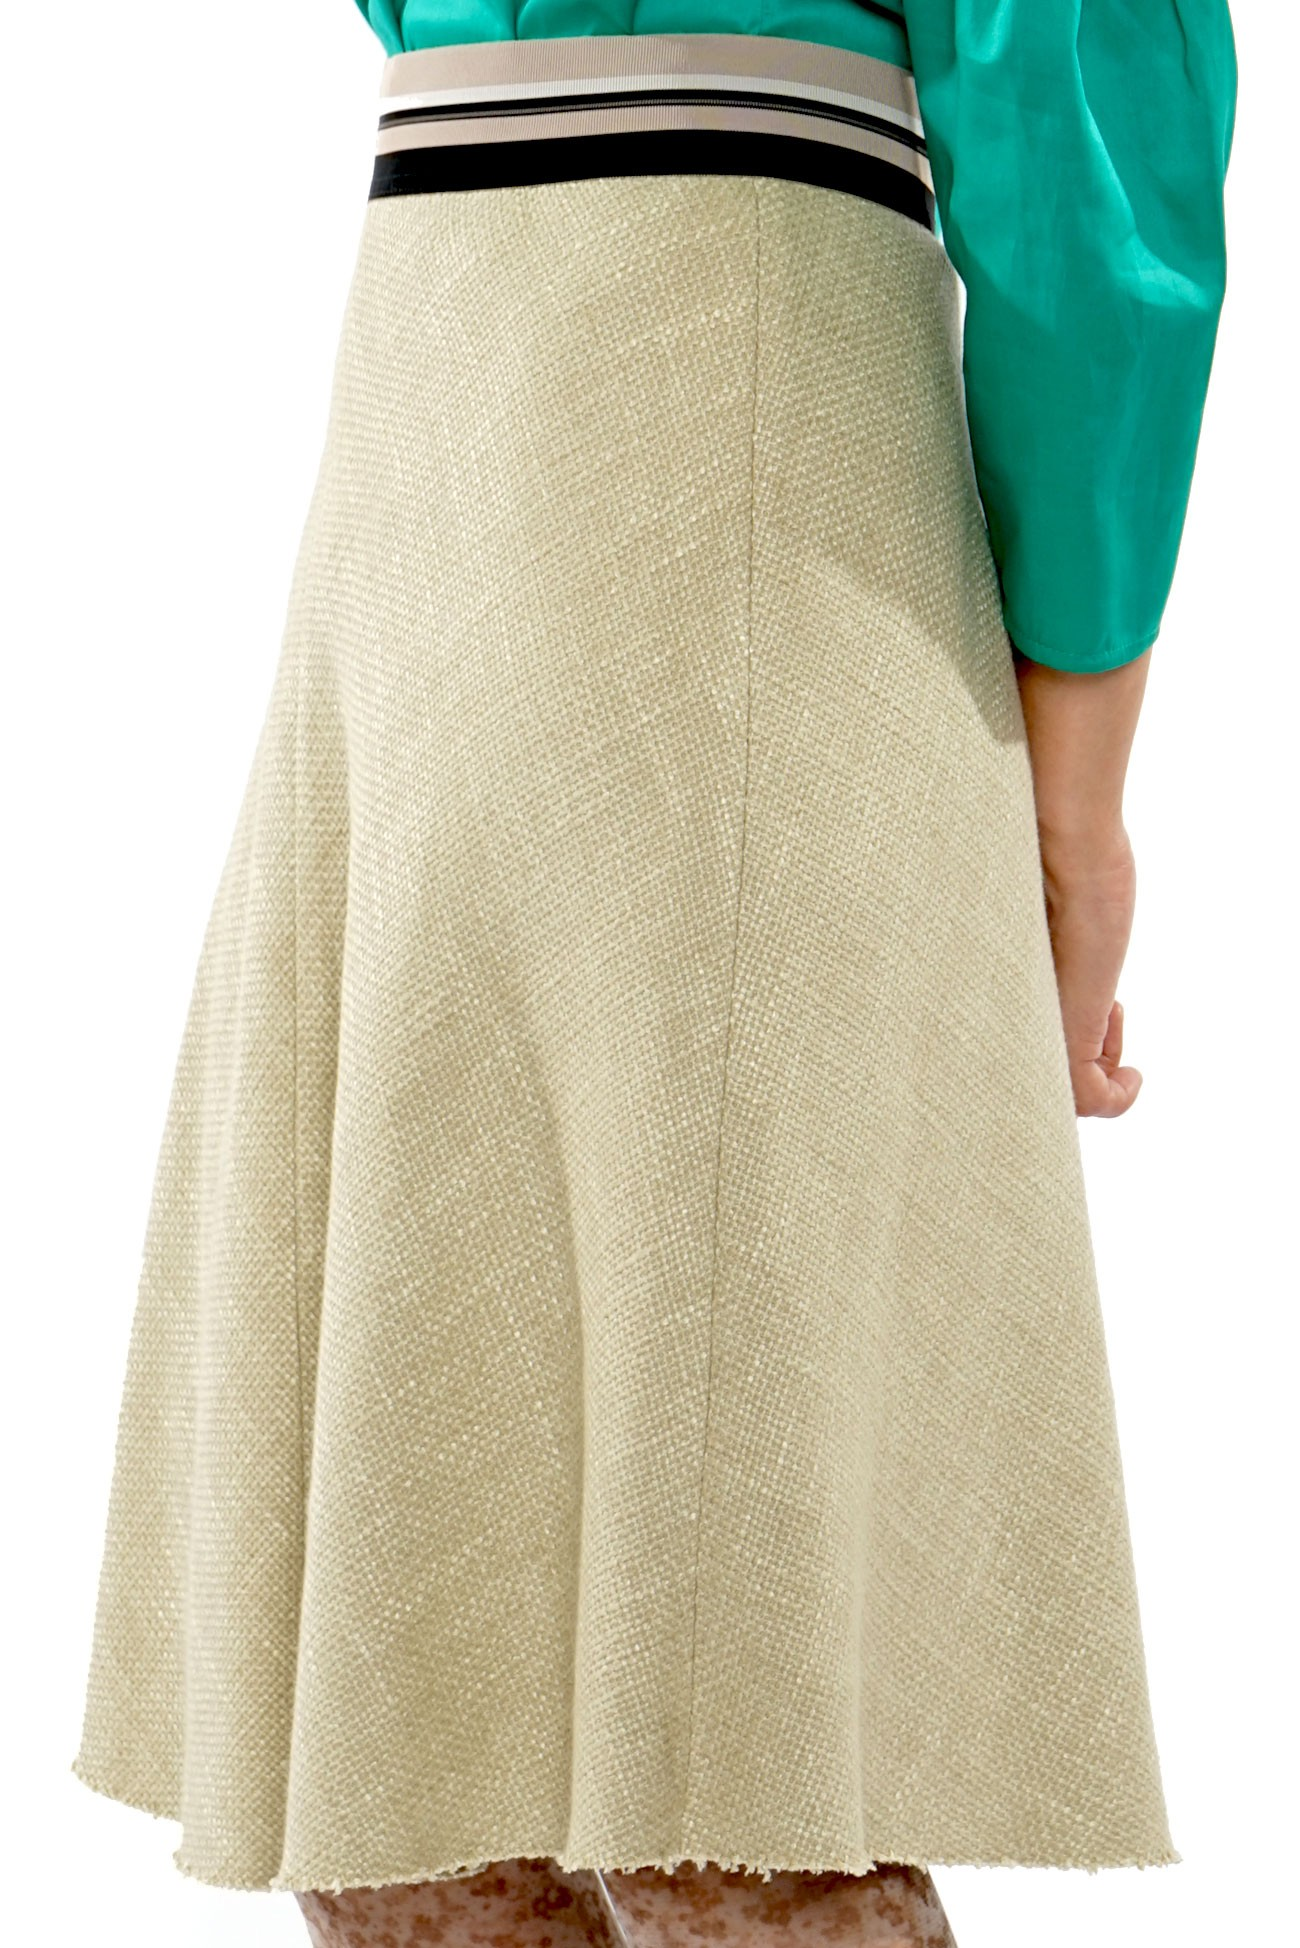 Beige skirt with elastic waist